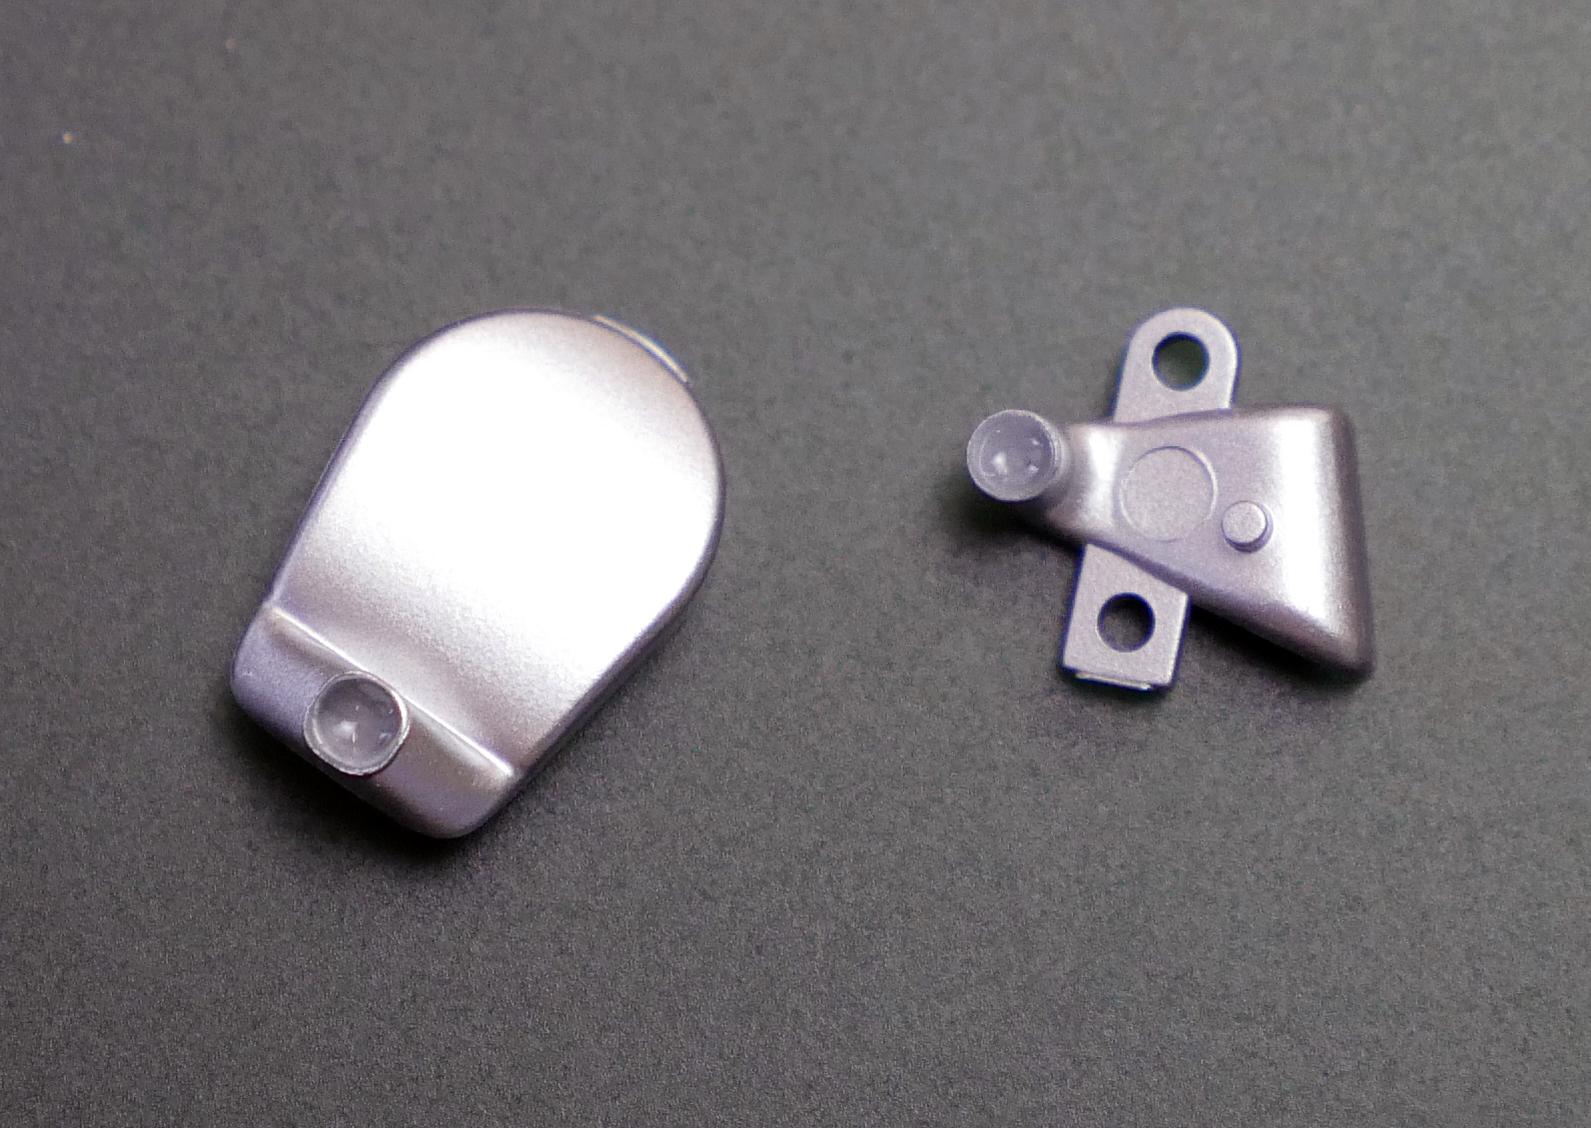 wearables_myo-armband-teardown-05.jpg